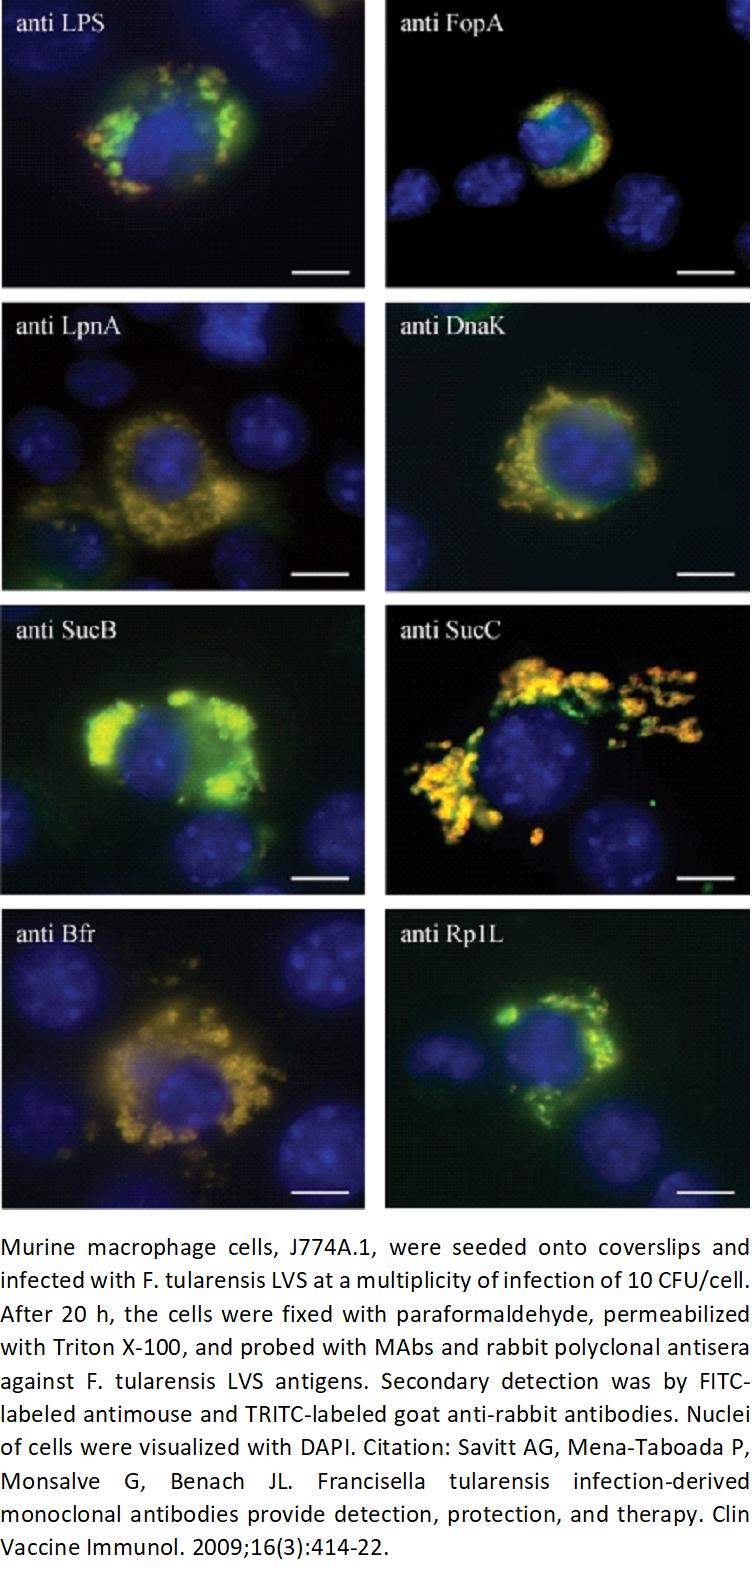 Image thumbnail for Anti-F. tularensis LVS FopA [47] Antibody